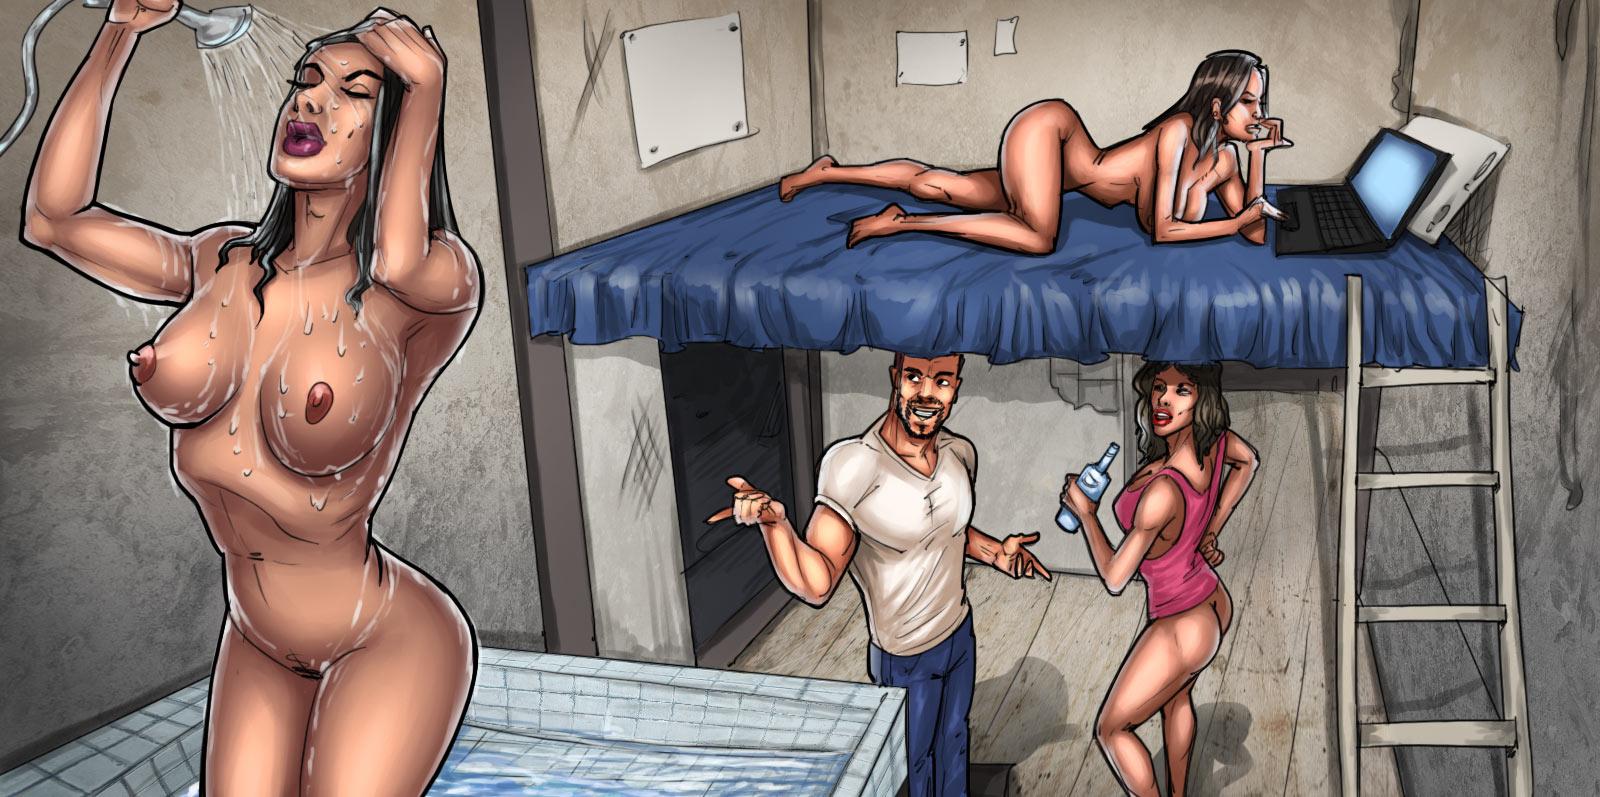 Секс игры со звуком